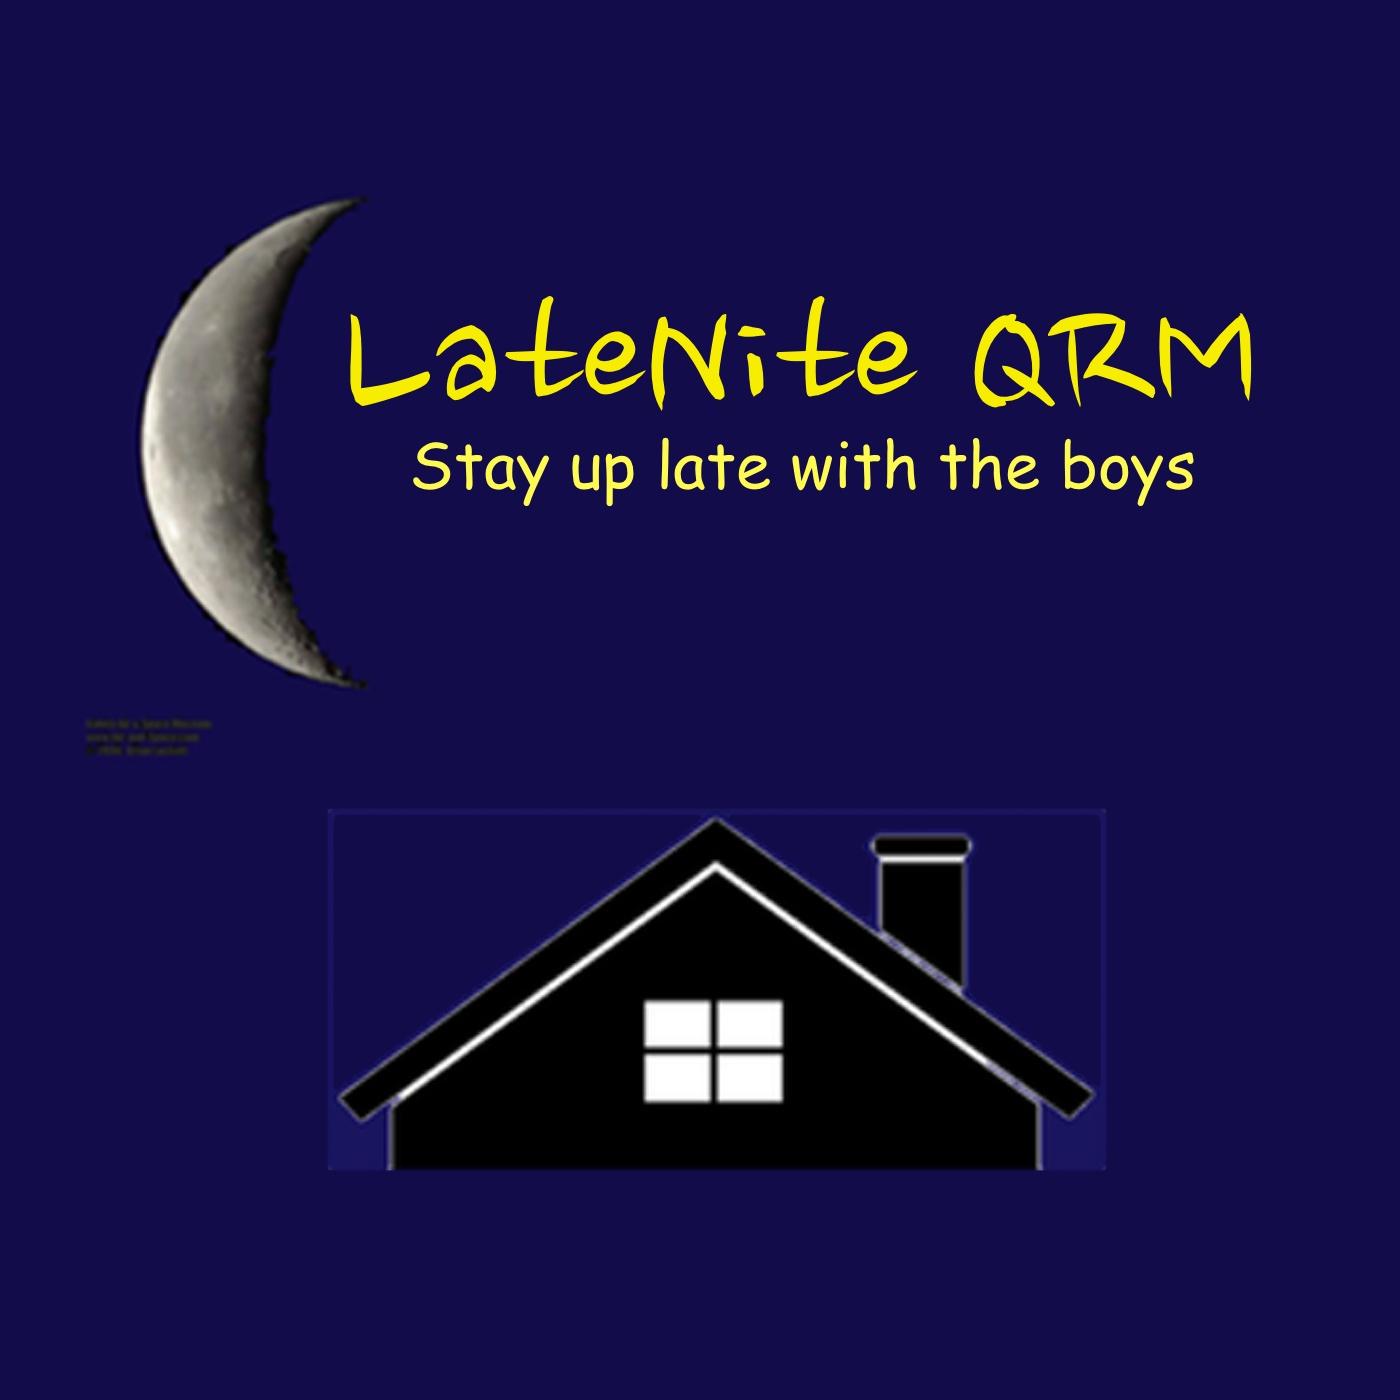 LateNite QRM